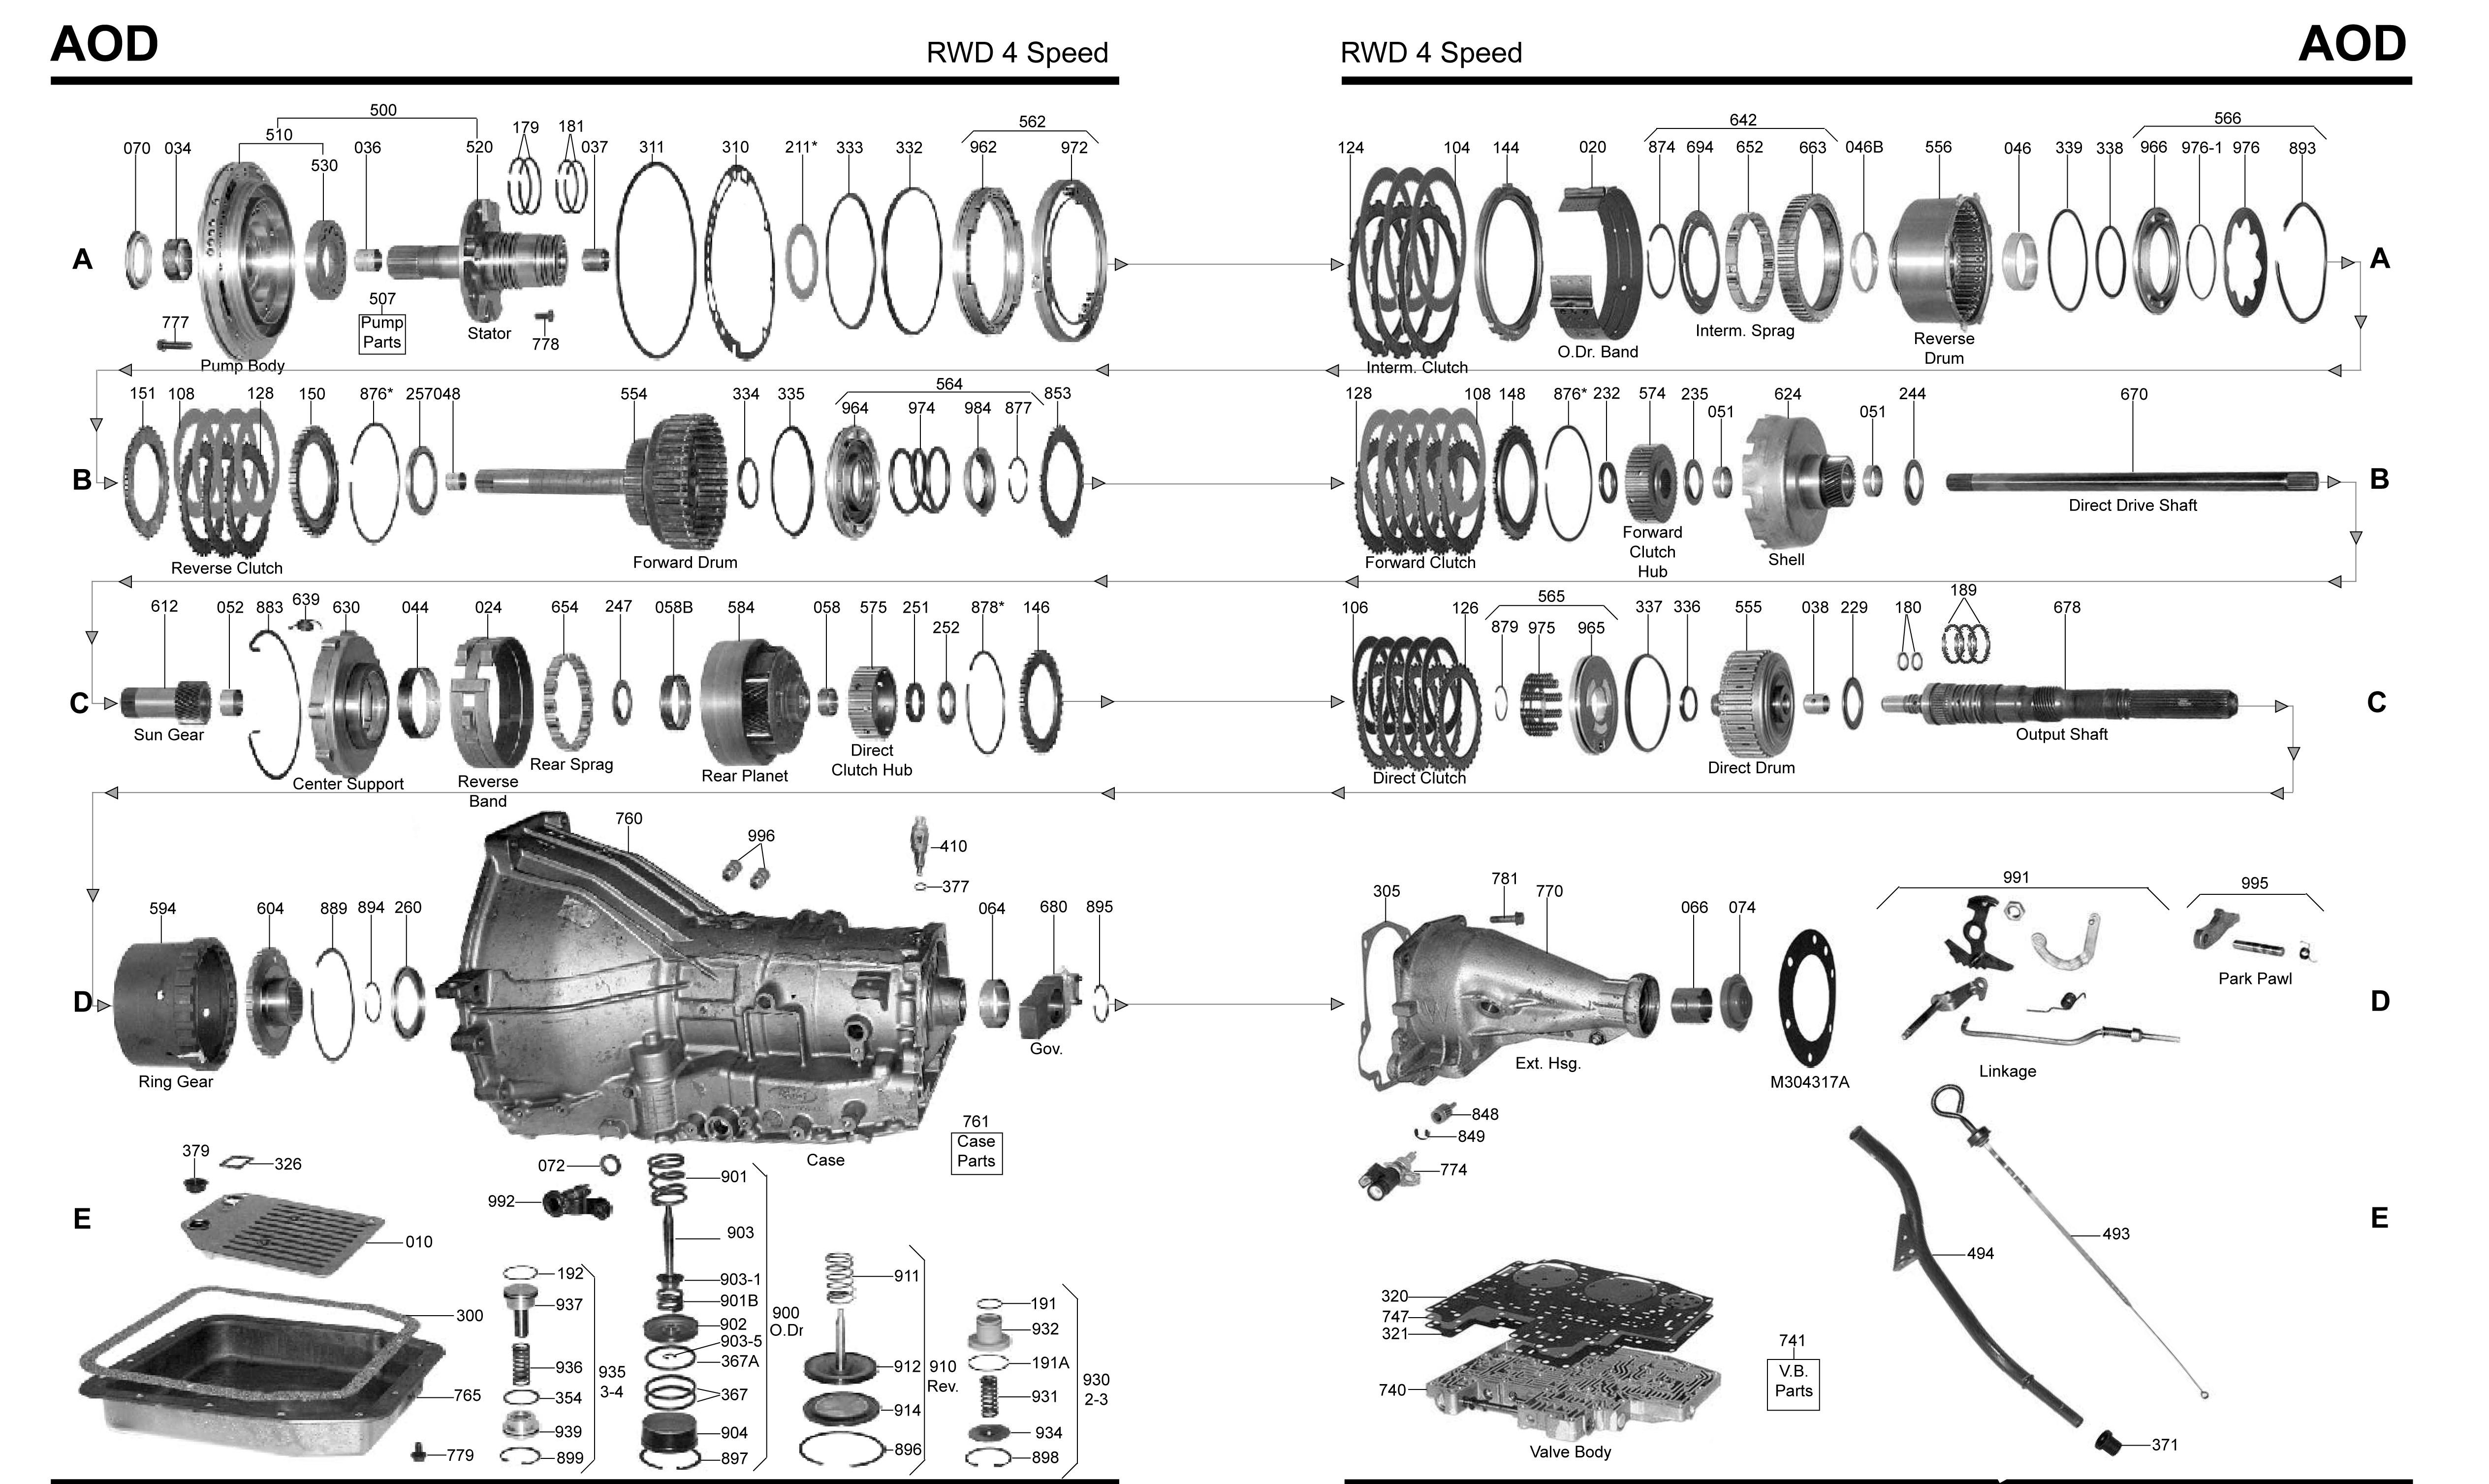 Car Parts List Diagram 4r70w Transmission Diagram Wiring Diagram Of Car Parts List Diagram